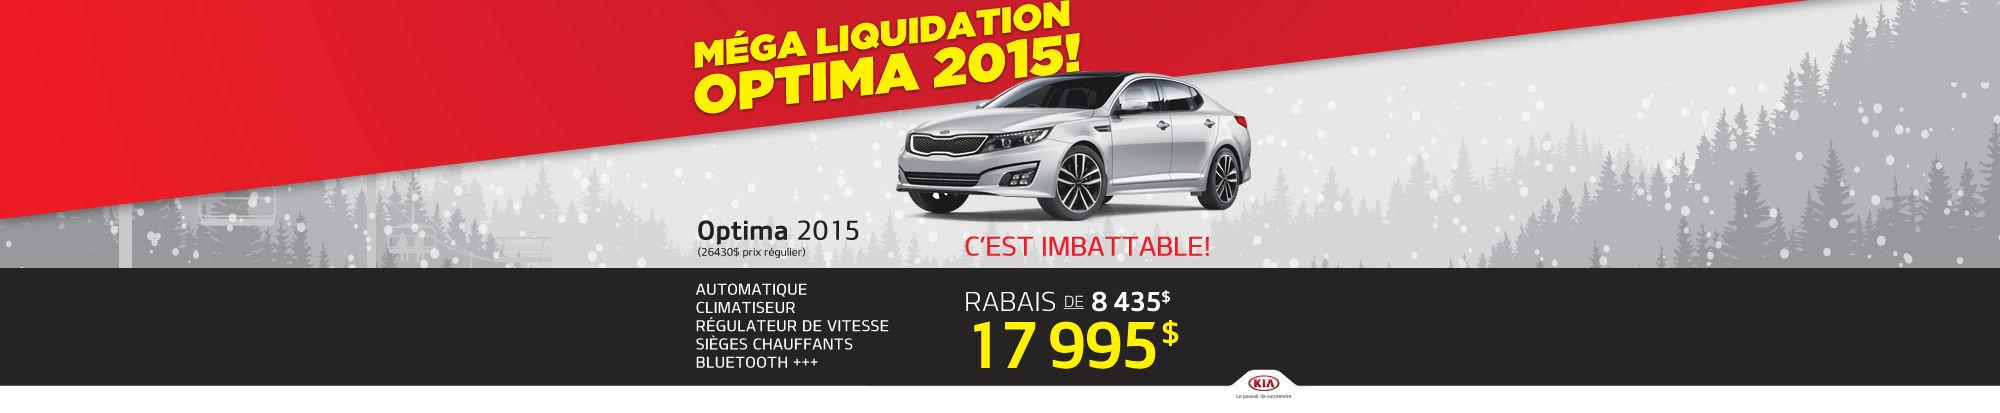 Méga liquidation - Optima 2015